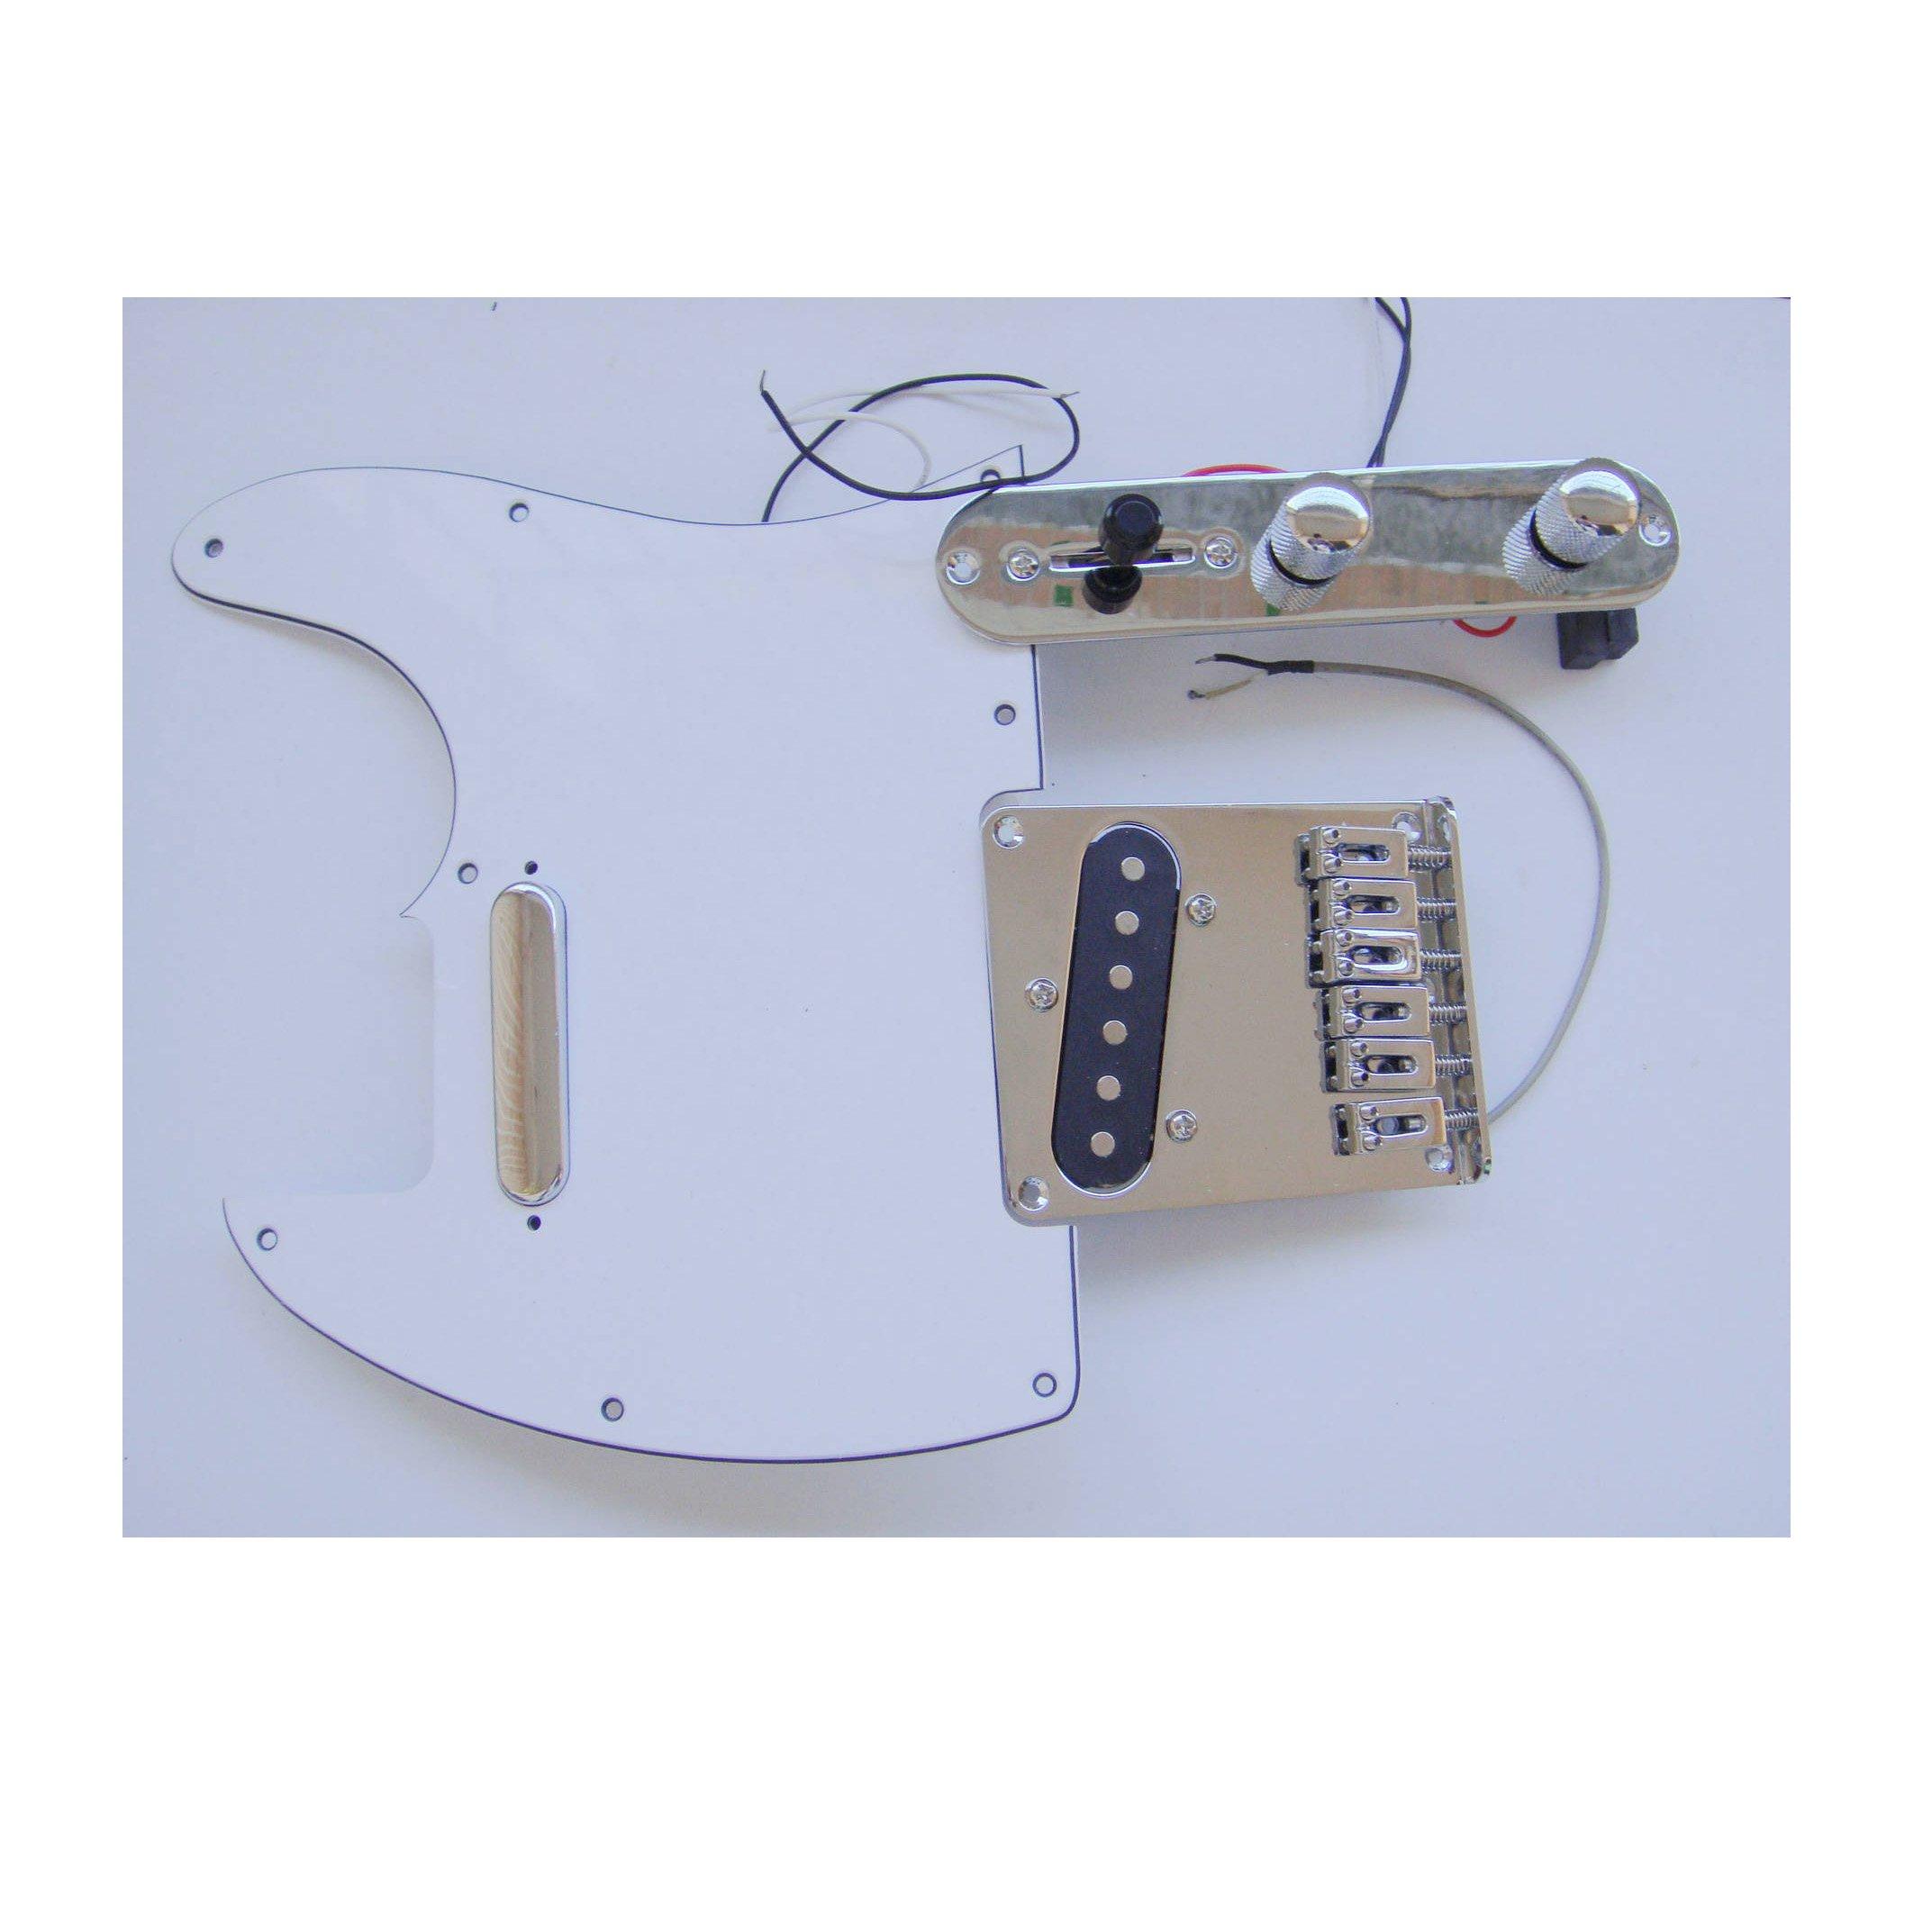 Fastmusic Prewired White 3Ply Tele Guitar Pickguard Control Bridge Kit